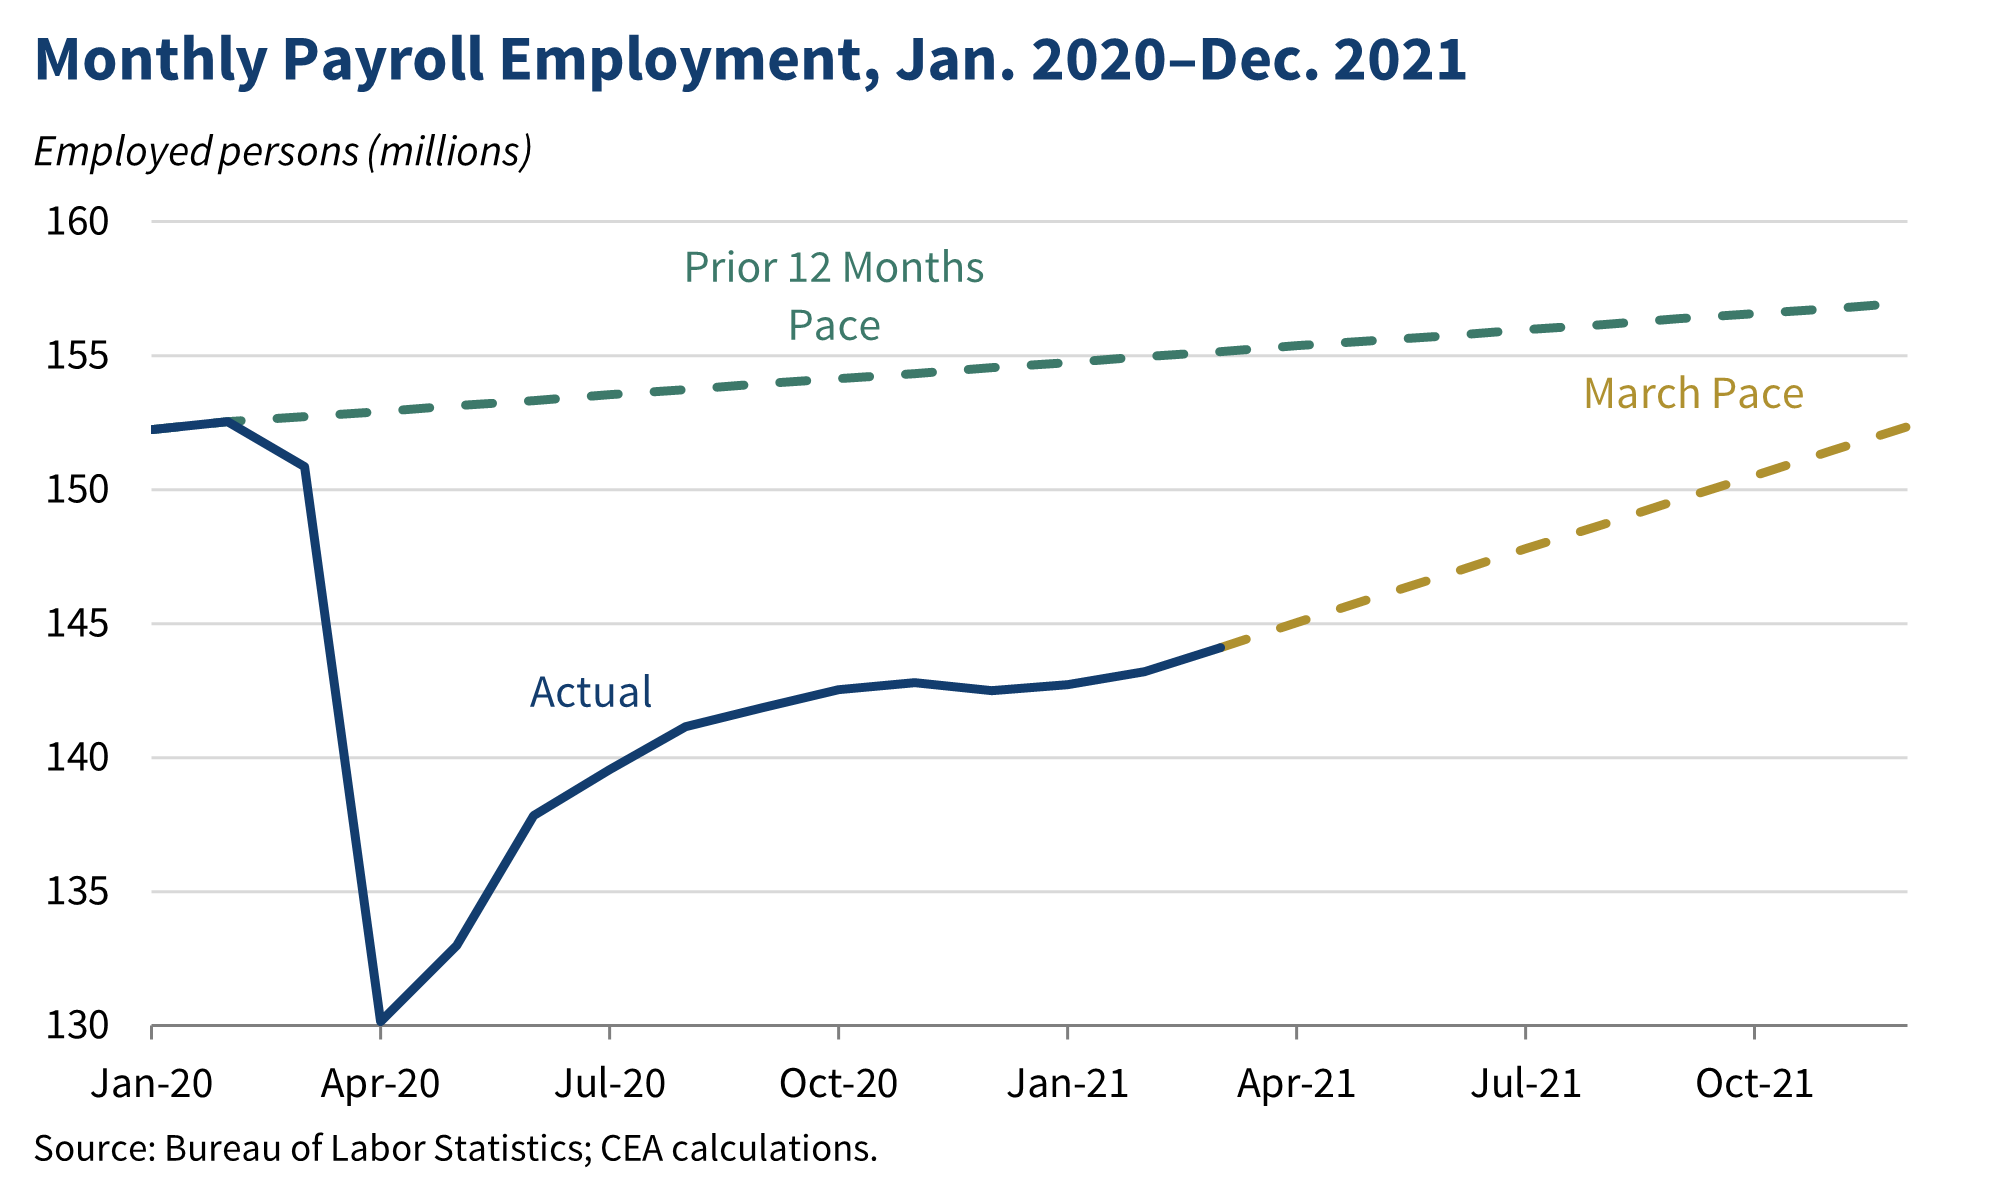 Monthly Payroll Employment, Jan. 2020-Dec. 2021